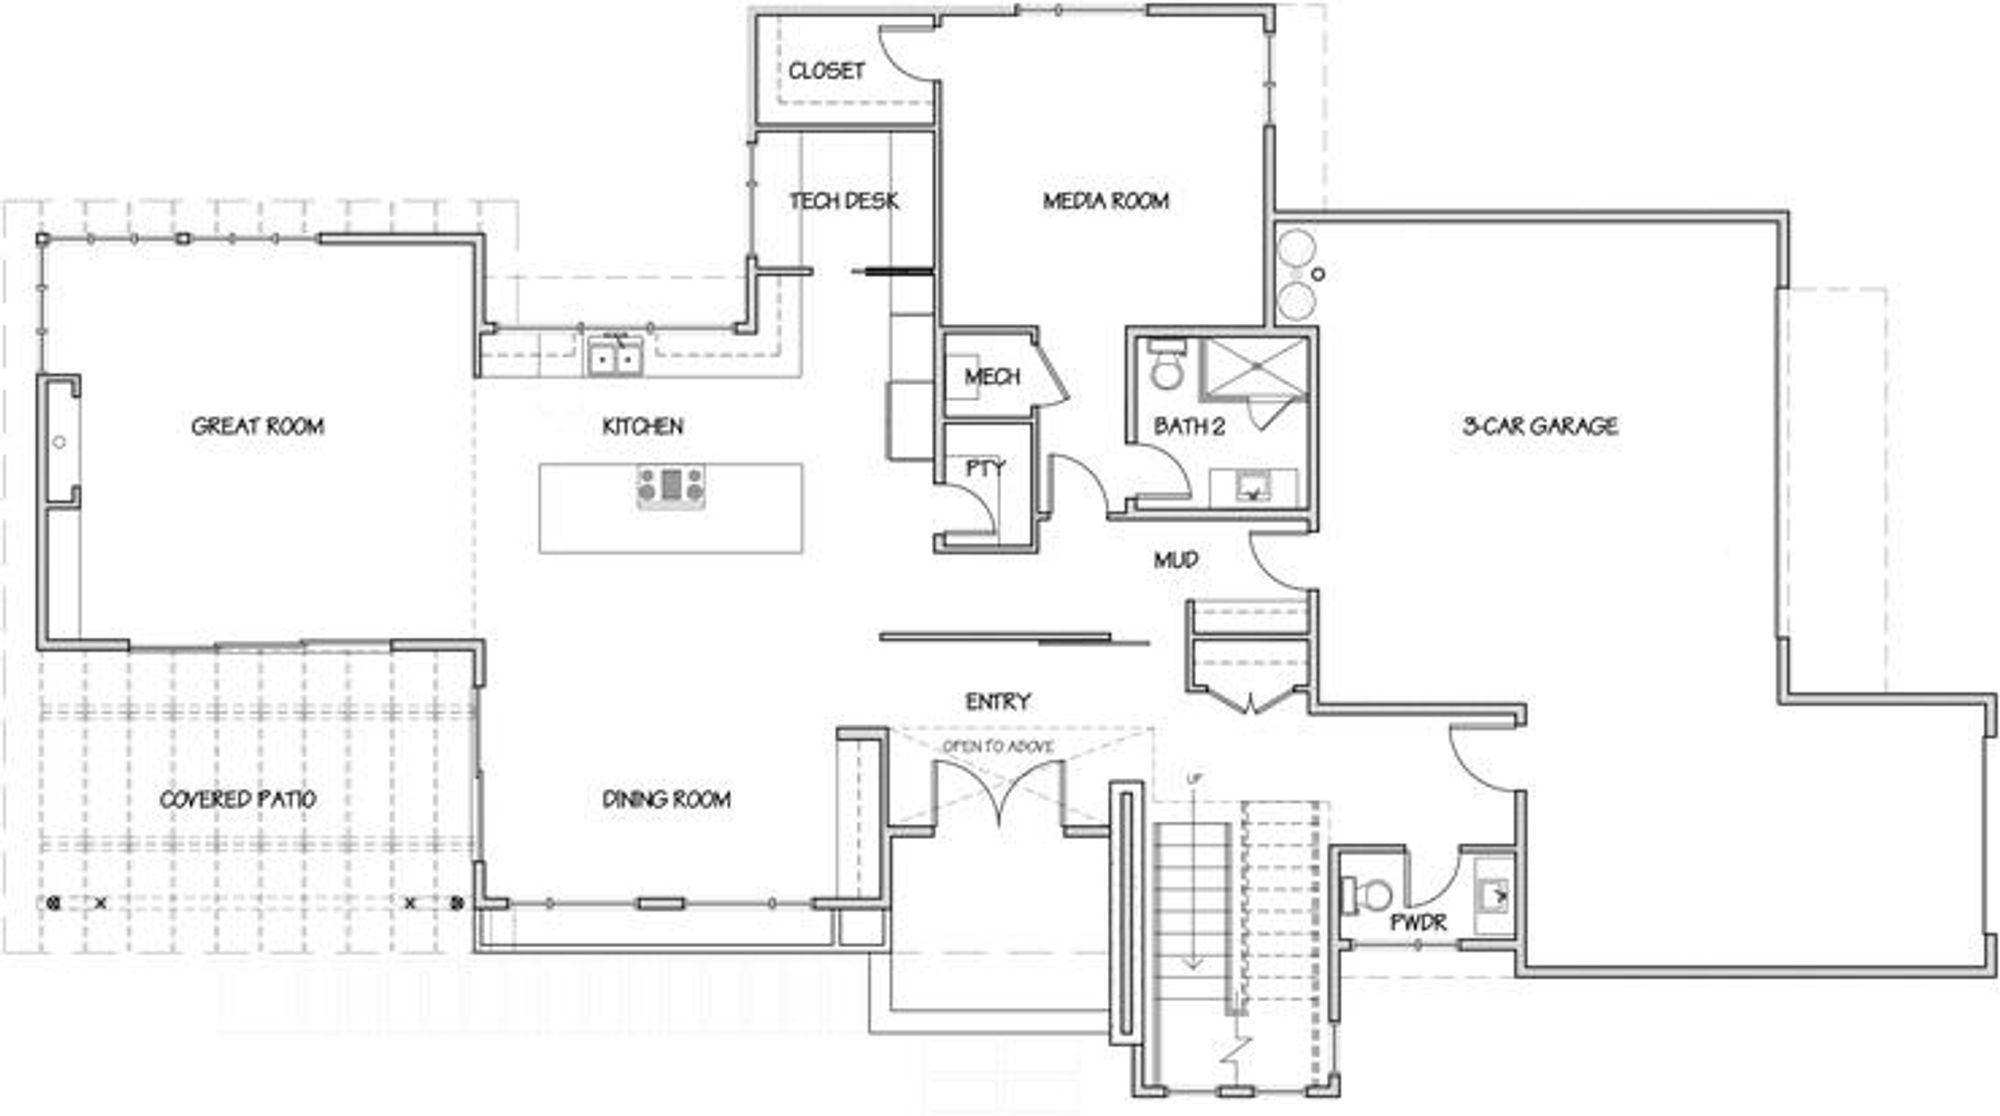 Singapore Main Floor Plan